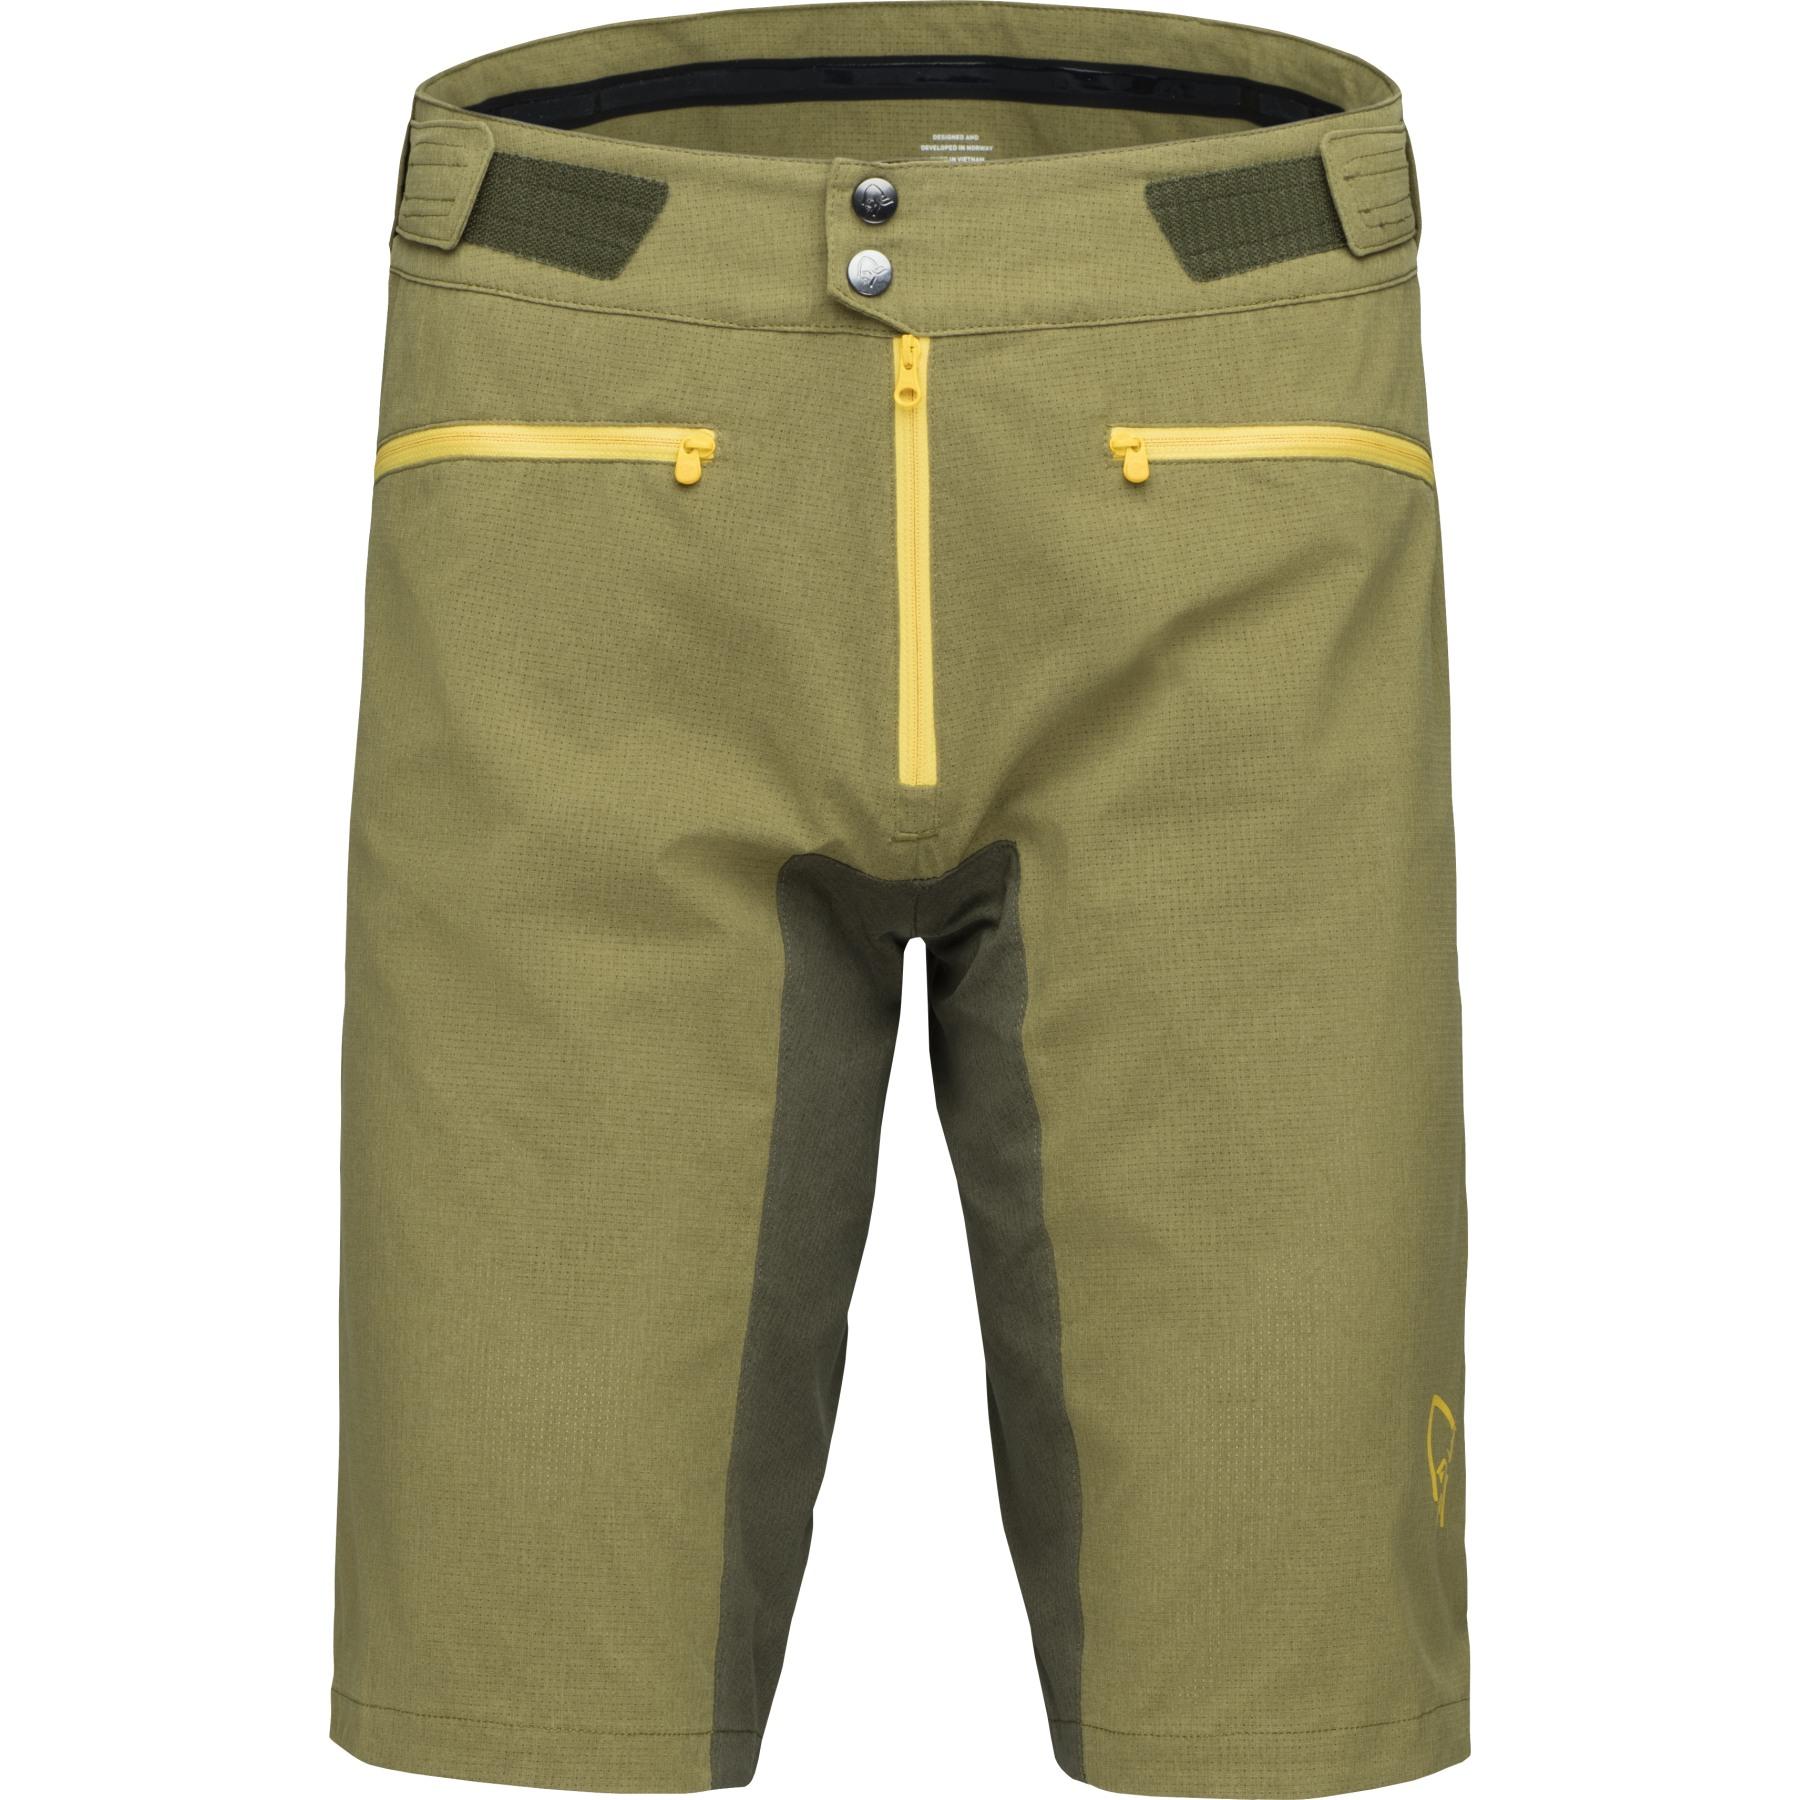 Norrona fjora flex1 lightweight Shorts Men - Olive Night/Lemon Chrome